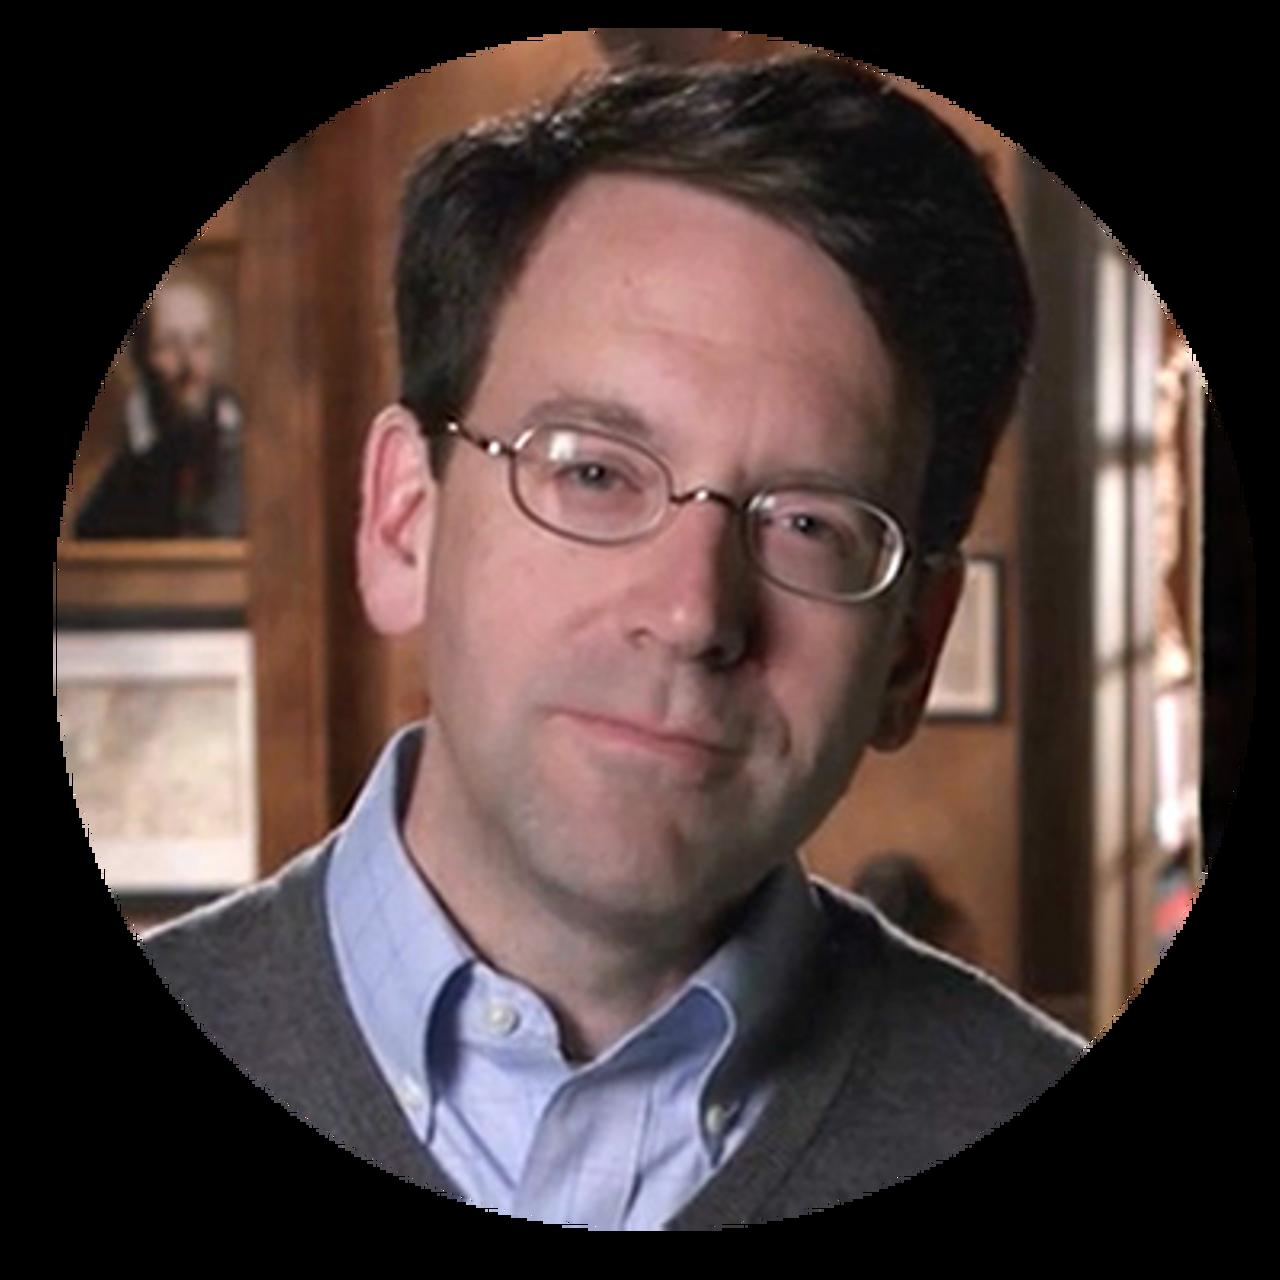 Dr. Christopher Blum